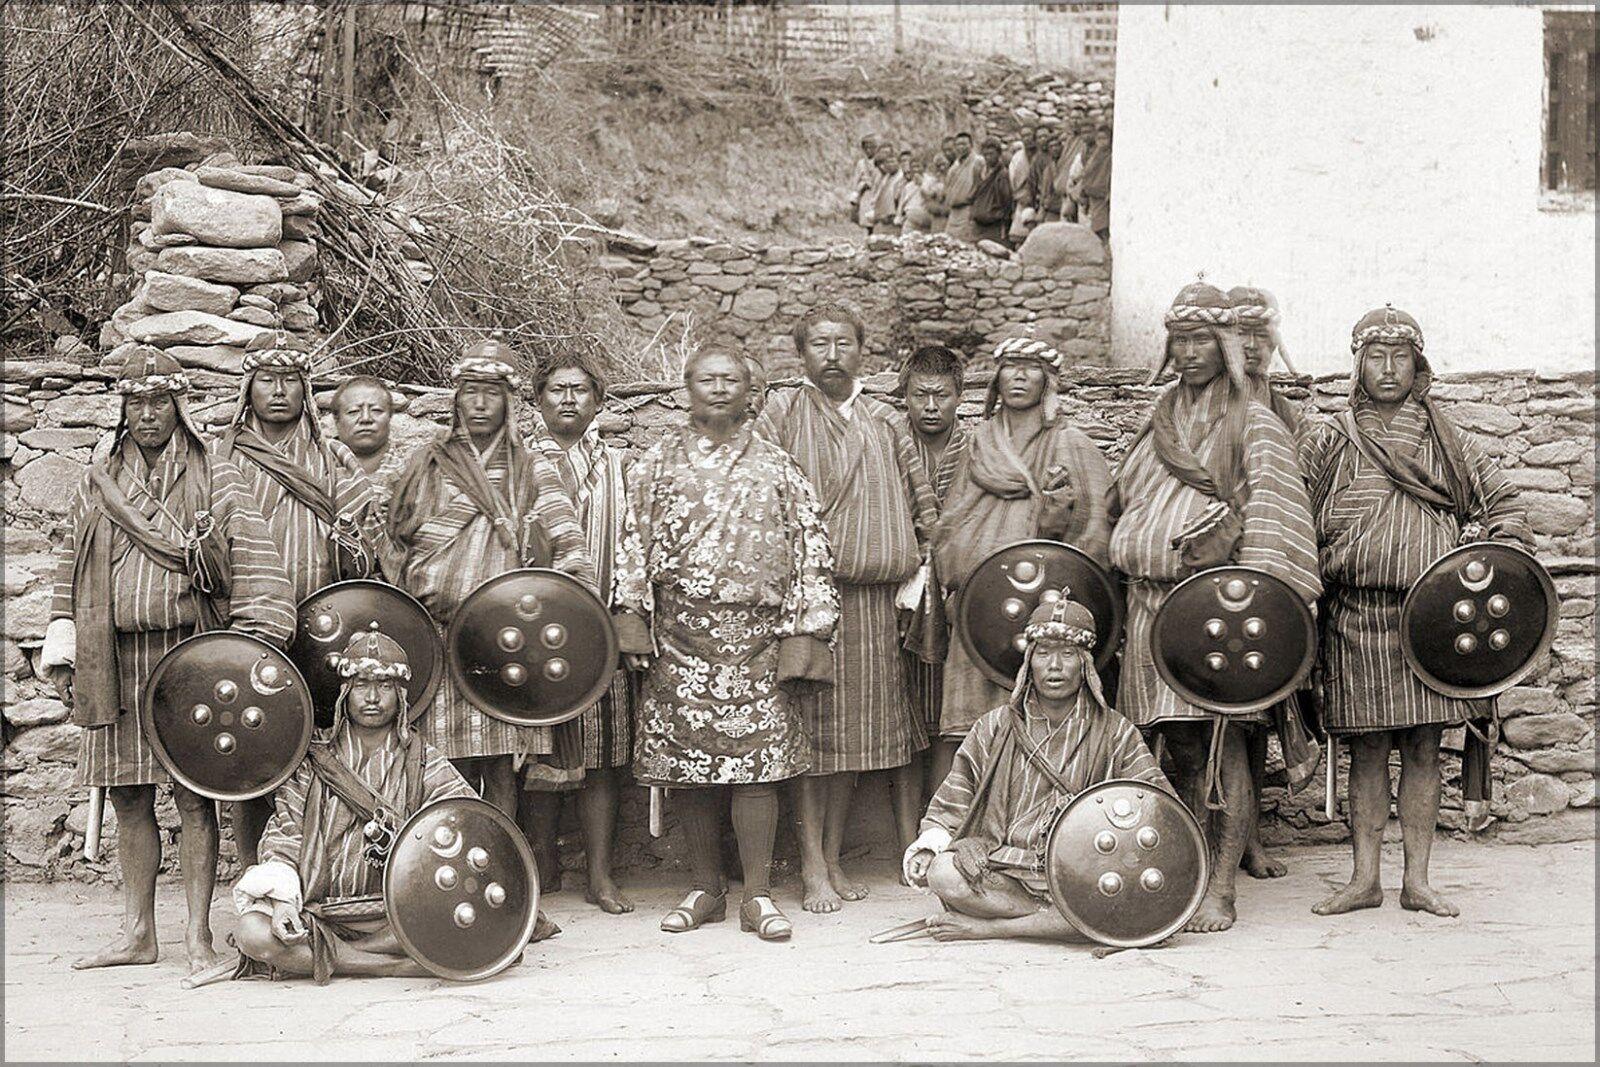 Poster, Many Größes; Sir Ugyen Wangchuk & His Bodyguards, Tongsa Dzong In Bhutan,